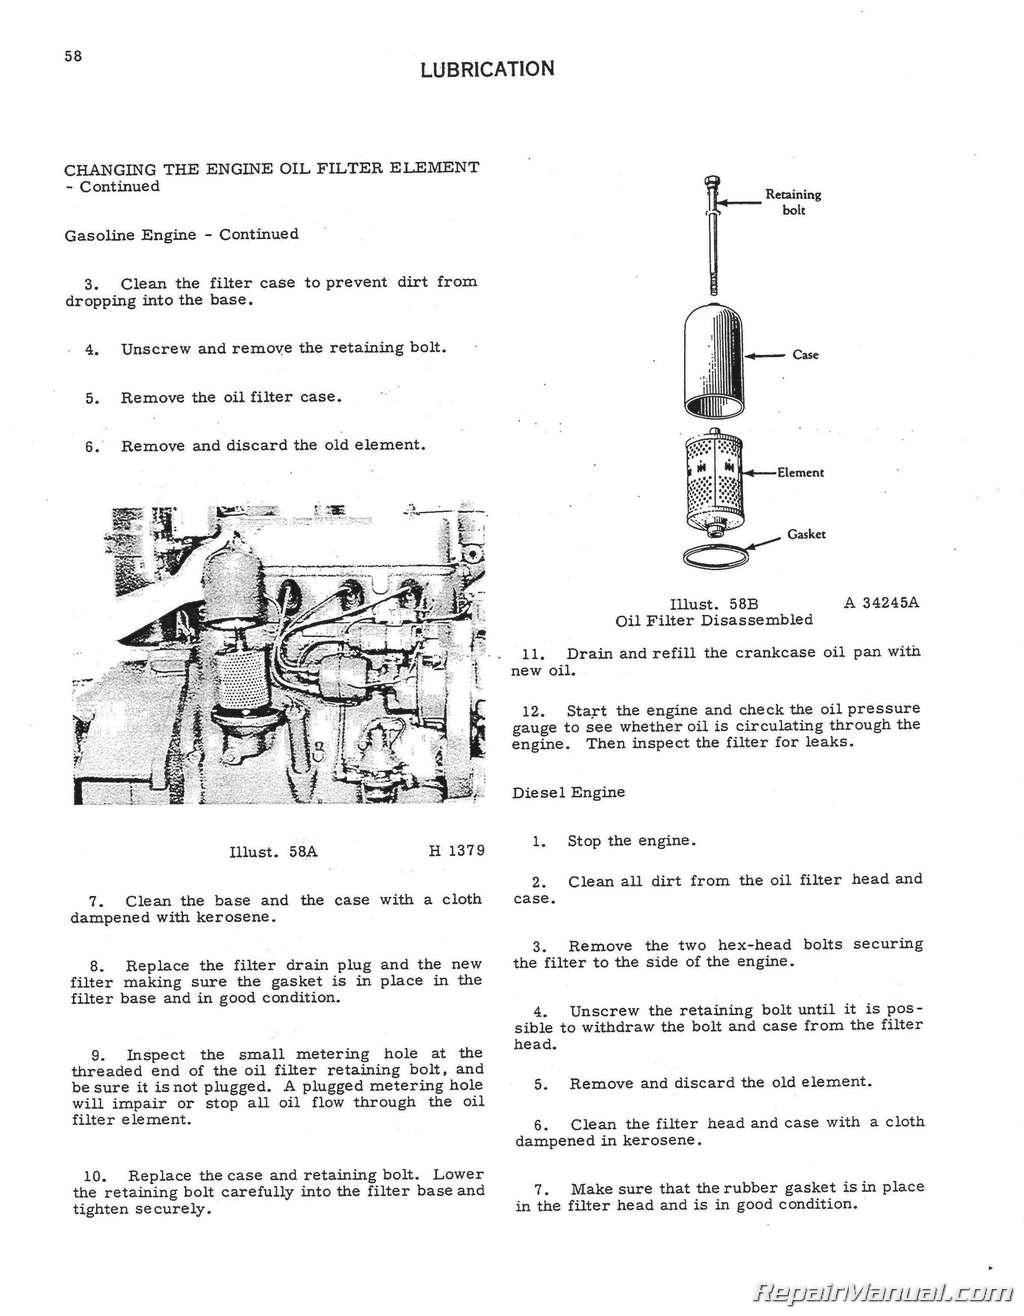 Wiring Motorola Diagram Alternator 8al2056k Wiring Diagram Ford 6600 Alternator Wiring Diagrams  sc 1 st  Auto-Acce.com : wiring diagram for an alternator - yogabreezes.com